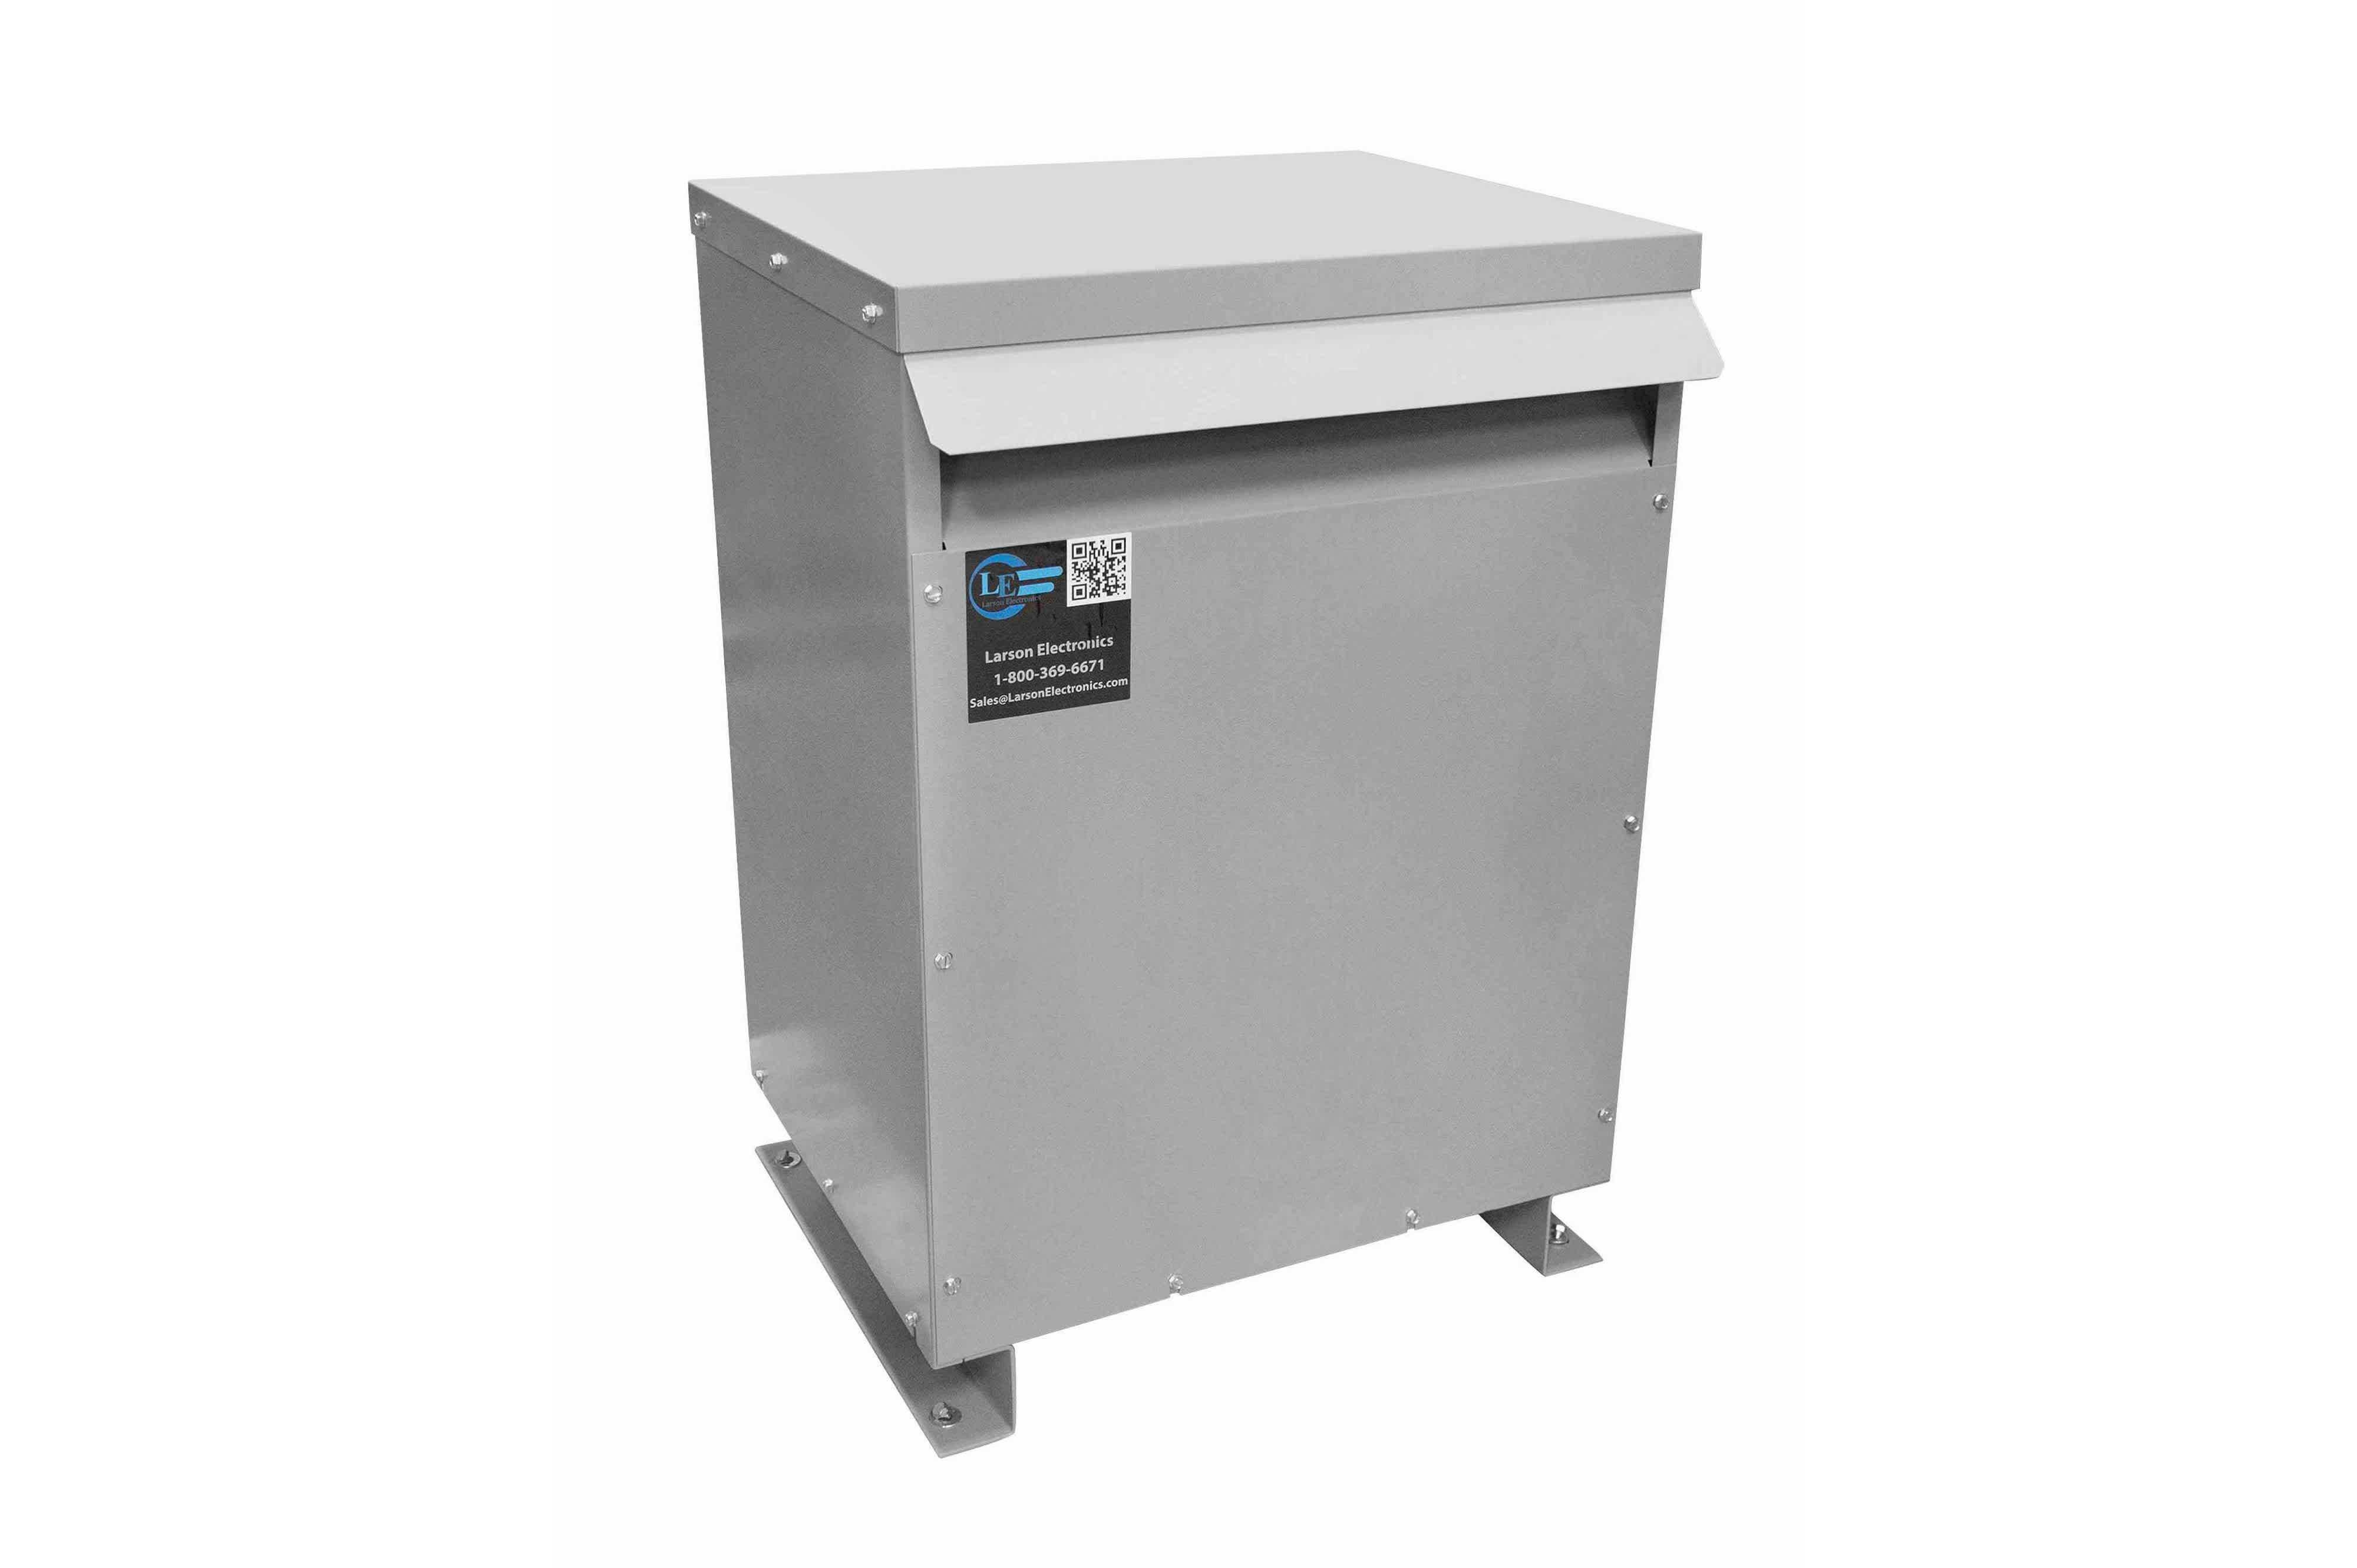 25 kVA 3PH Isolation Transformer, 600V Wye Primary, 208V Delta Secondary, N3R, Ventilated, 60 Hz